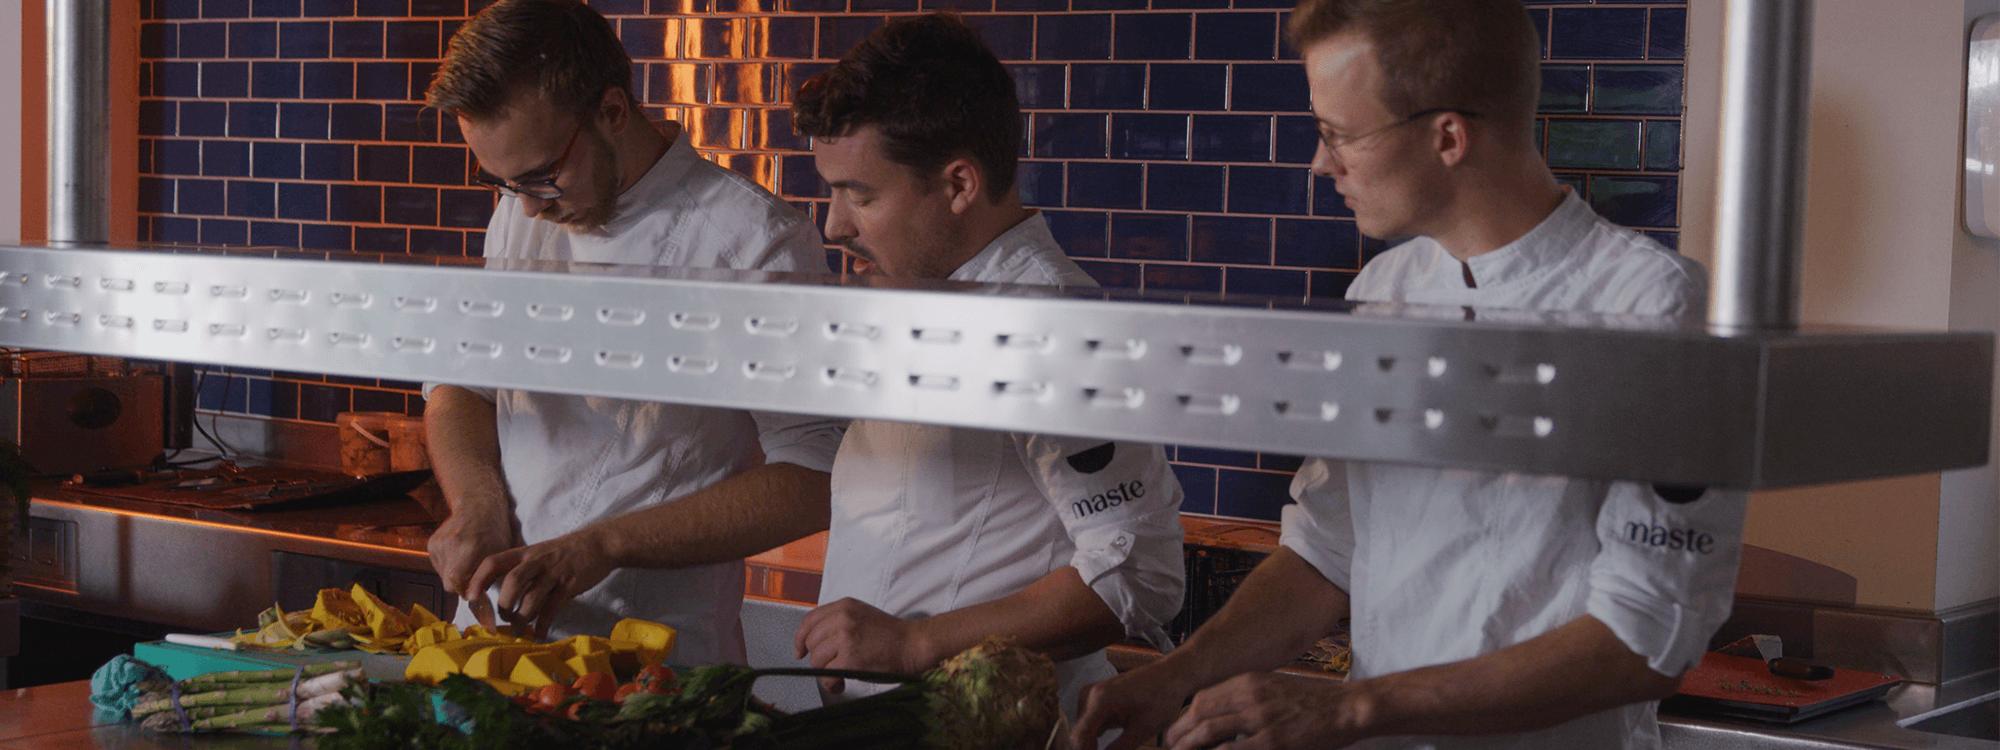 Comment Agencer Une Cuisine Professionnelle Lightspeed Restaurant